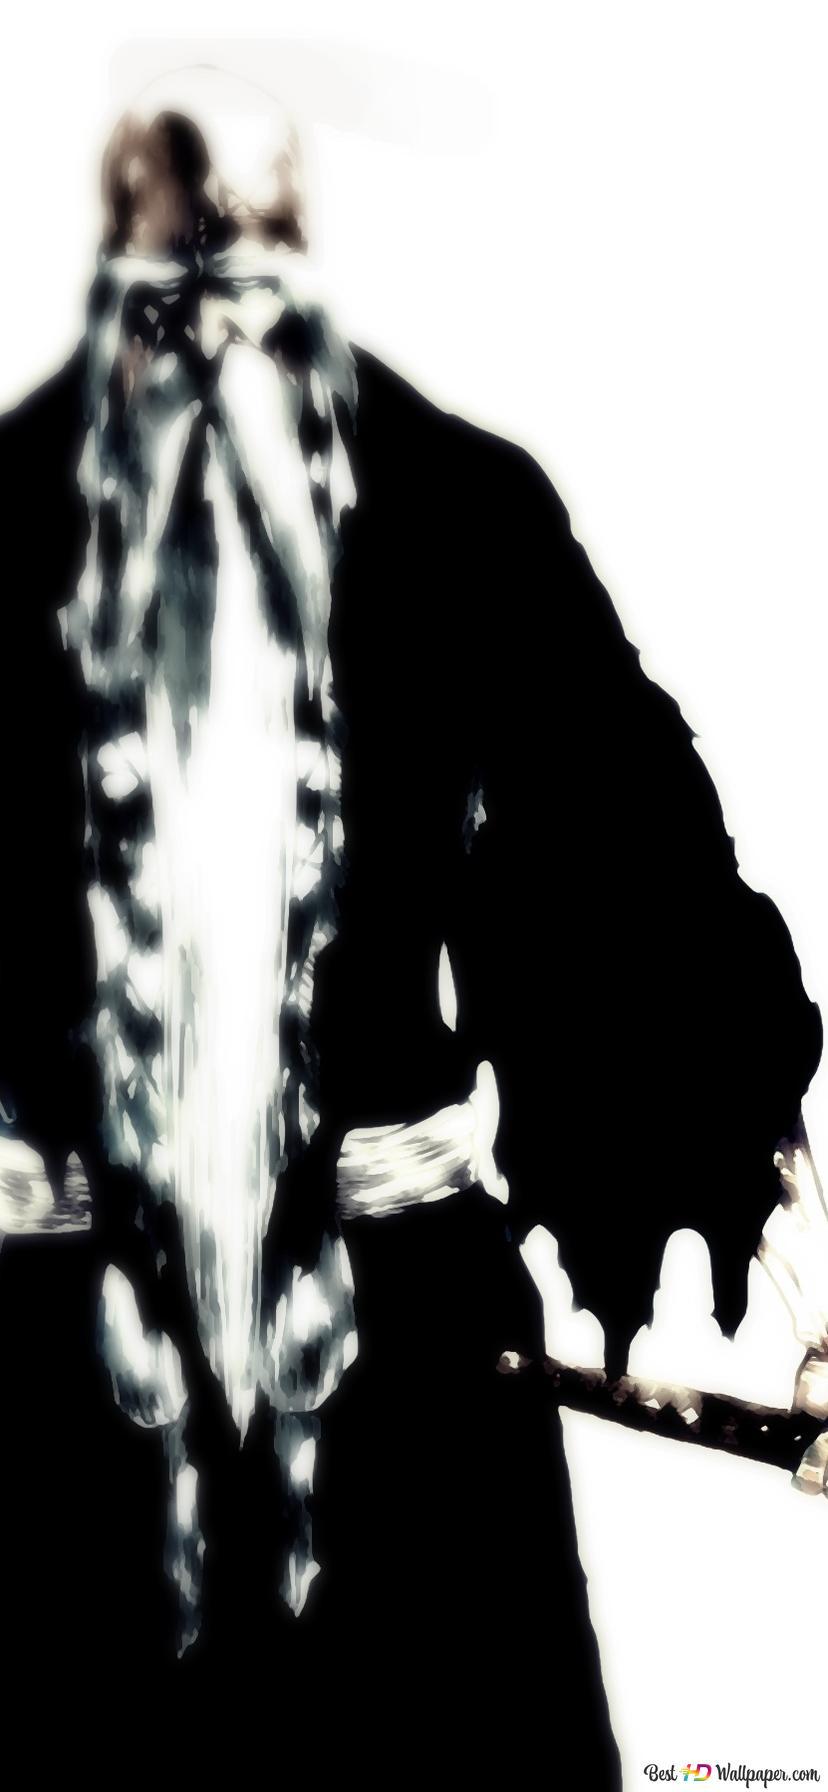 Descargar Fondo De Pantalla Bleach Yamamoto Hd